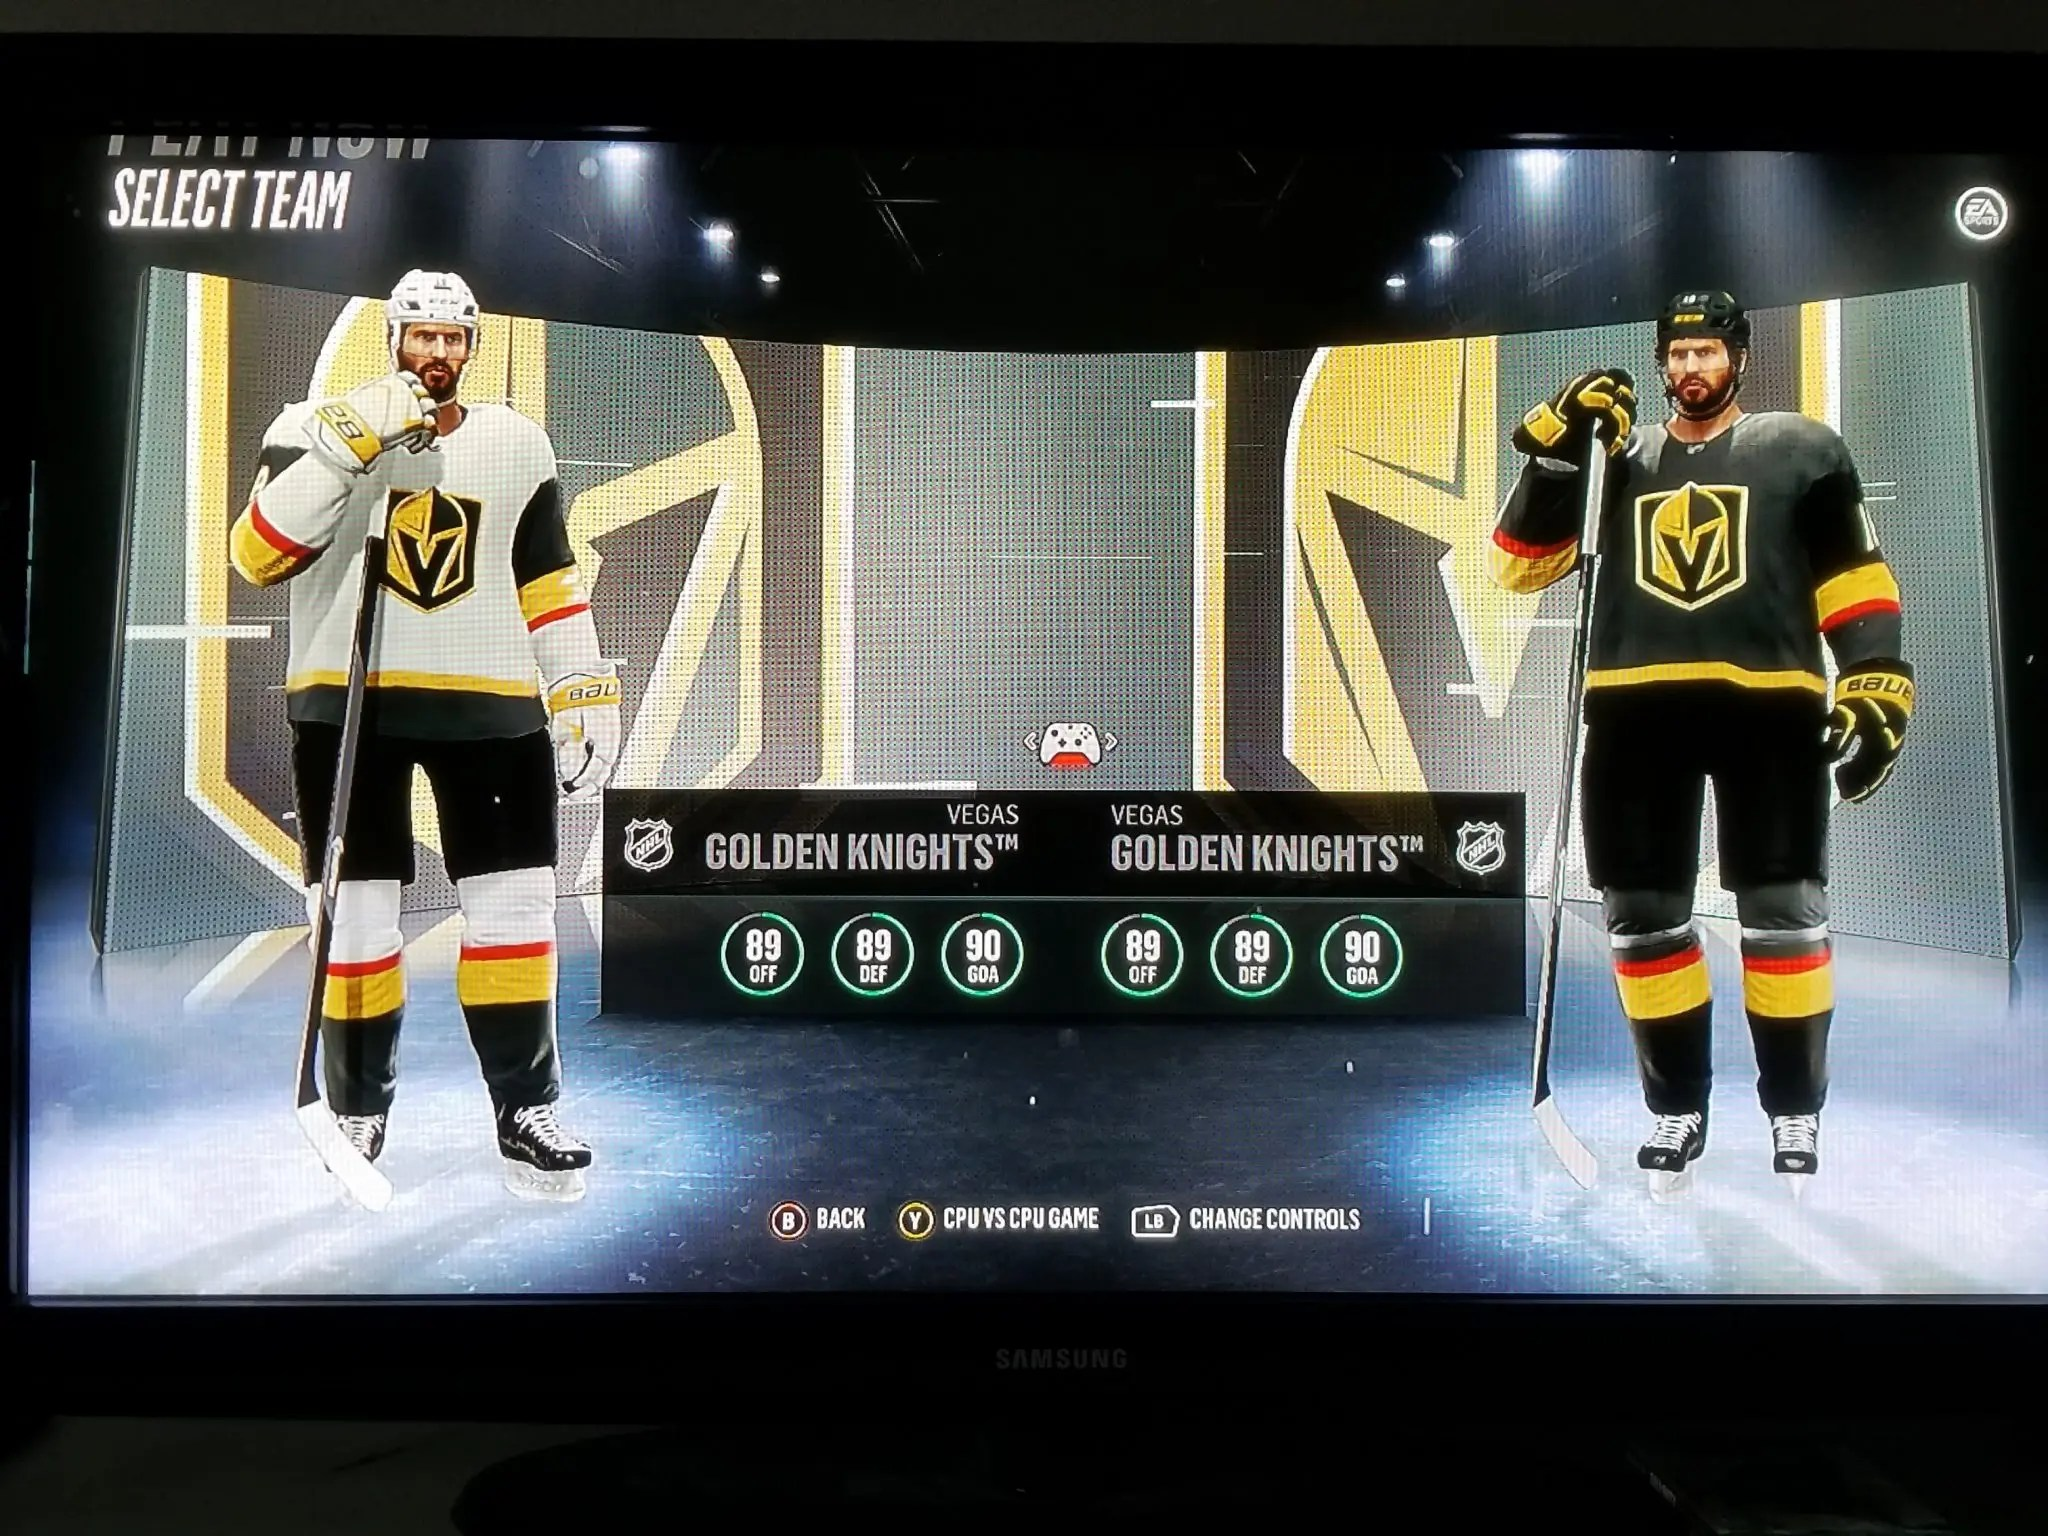 Golden Knights Player Ratings In NHL 18 - SinBin vegas